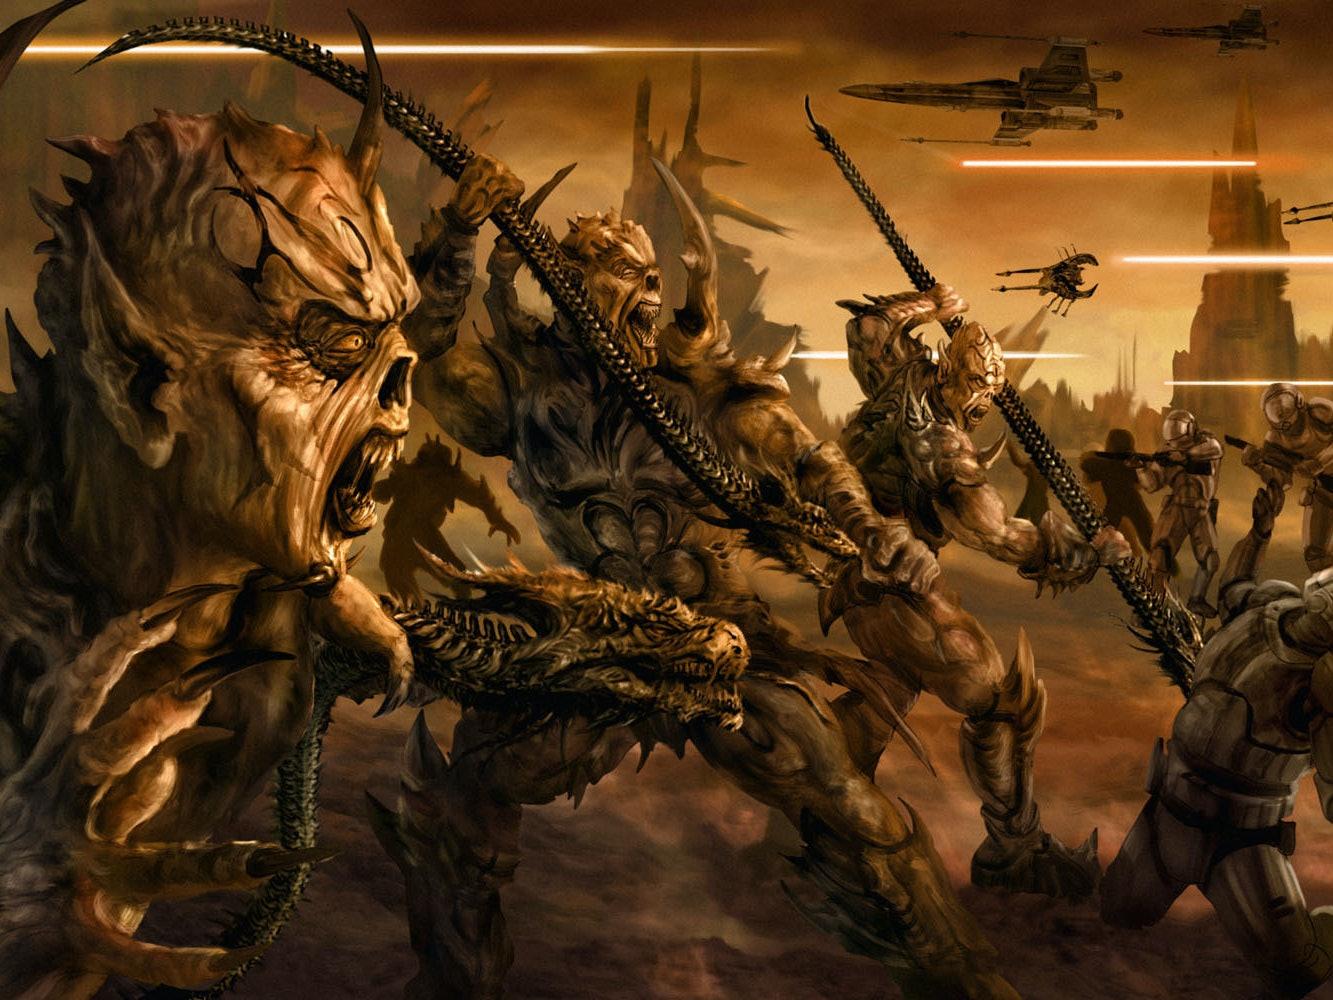 'Star Wars' Barely Escaped a Hacky Alien Invasion Plot